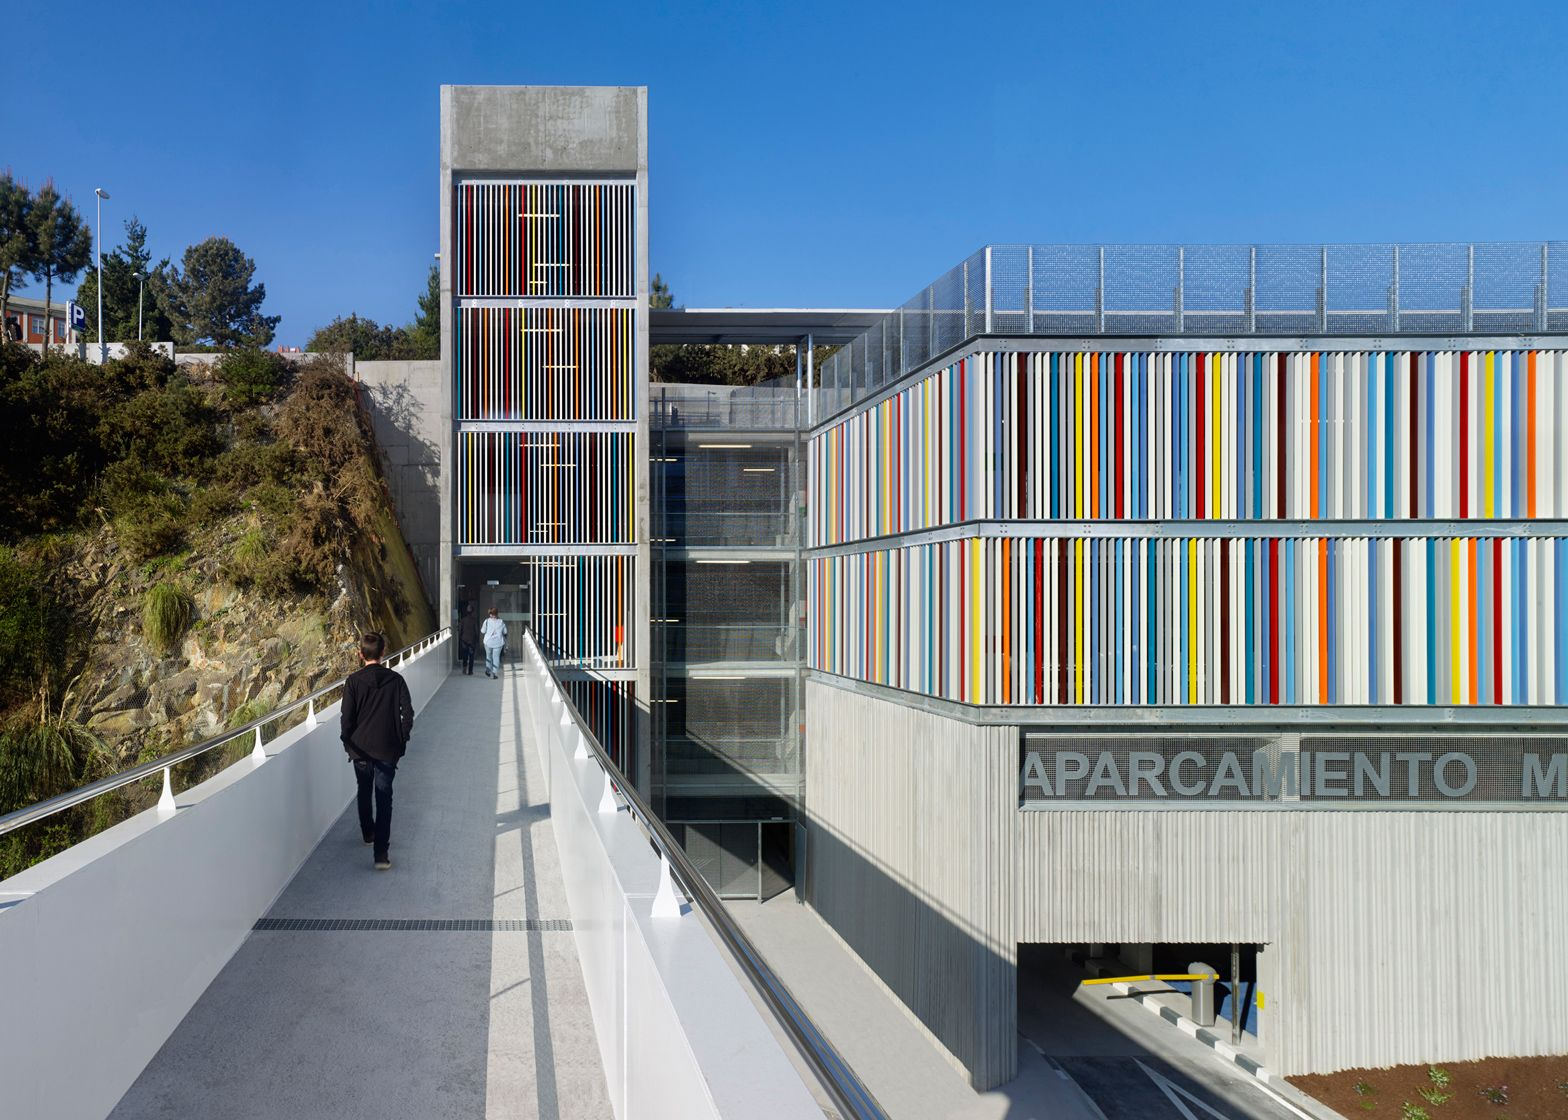 Design of basement car parking - Coloured Metal Slats And Textured Concrete Panels Enclose A Hospital Car Park In Spain